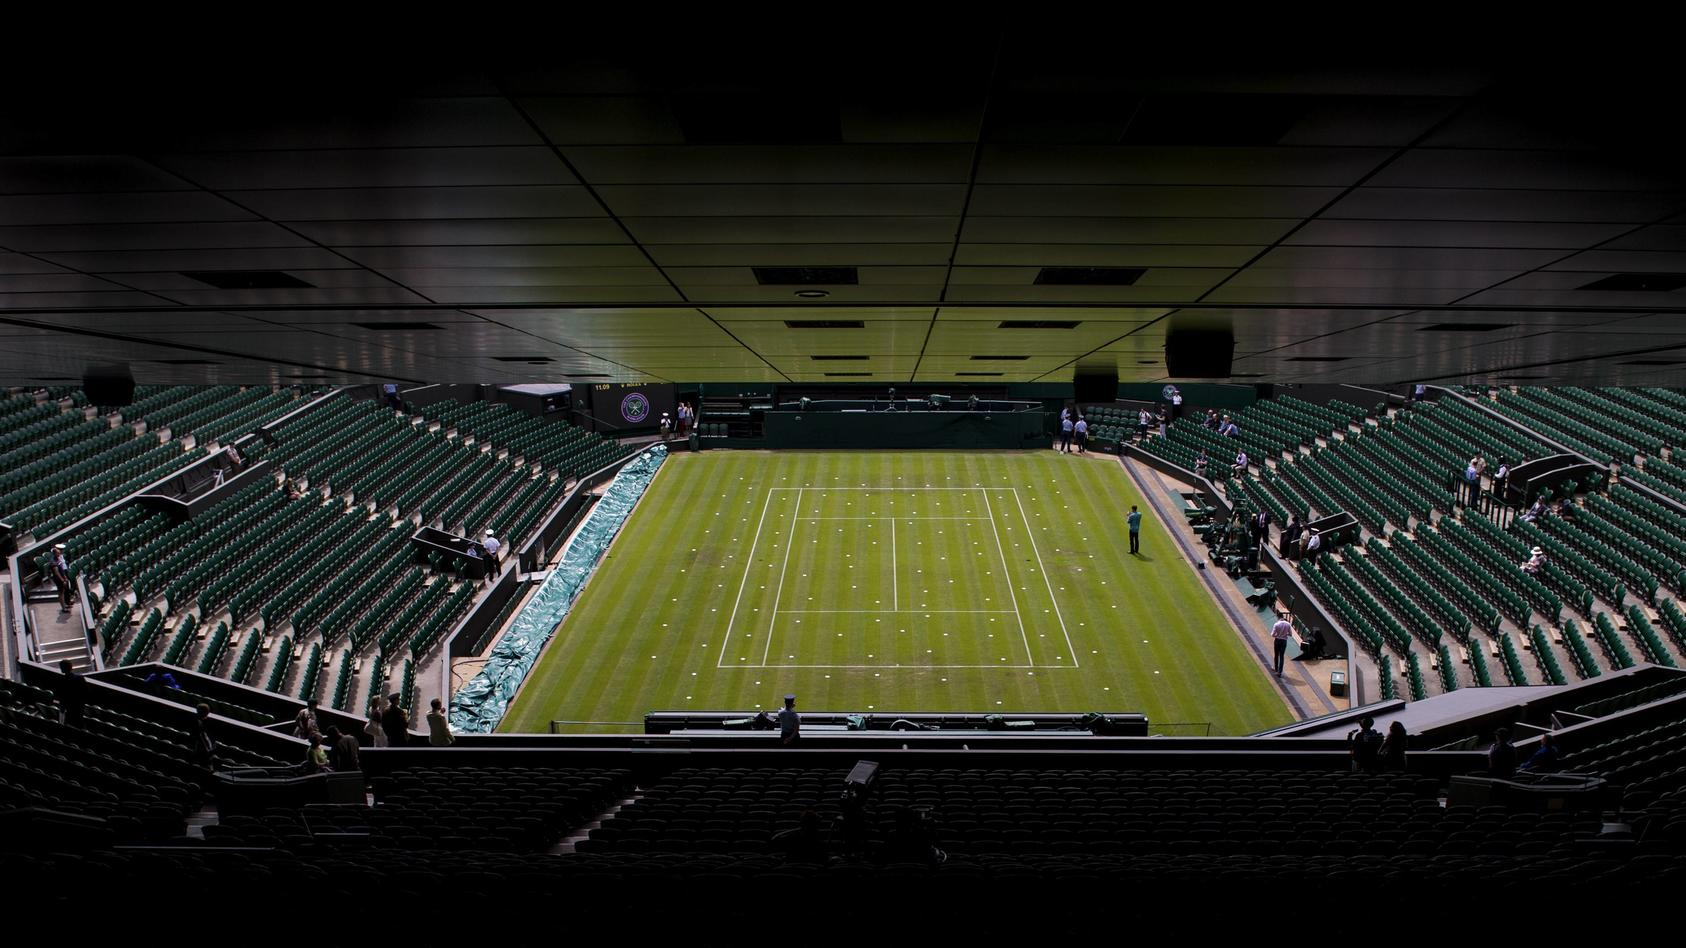 160628 Interiör över Centre Court under tennisturneringen Wimbledon den 28 juni 2016 i London. PUBLICATIONxINxGERxSUIxO